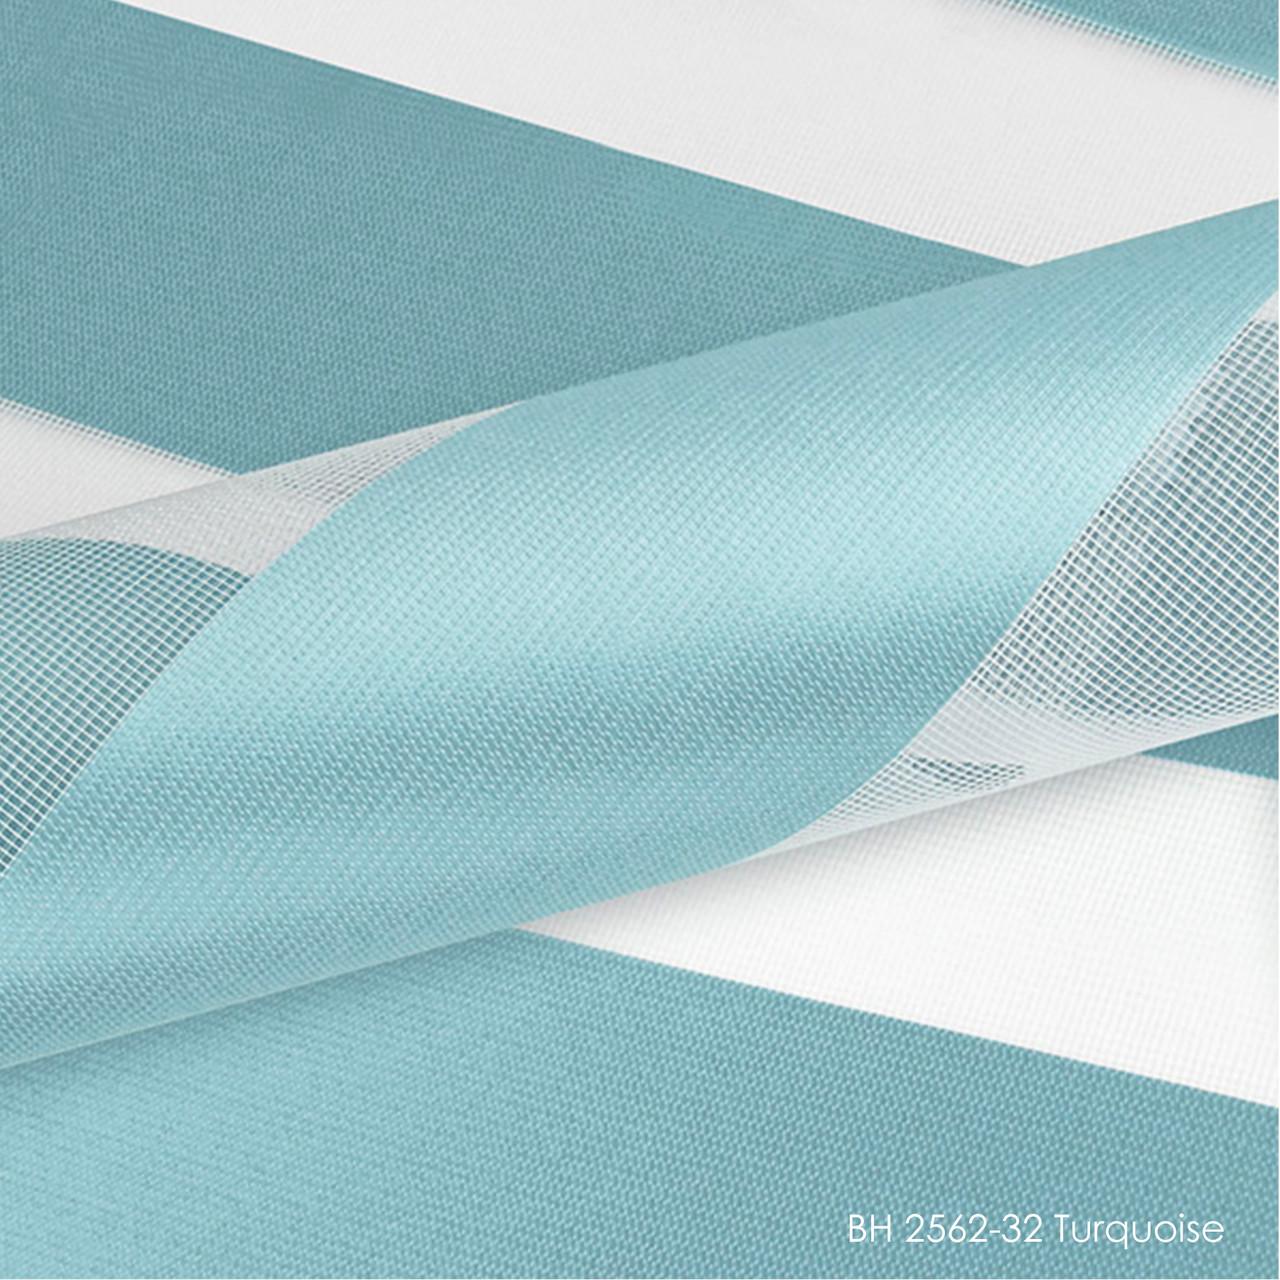 BH 2562-32 Turquoise